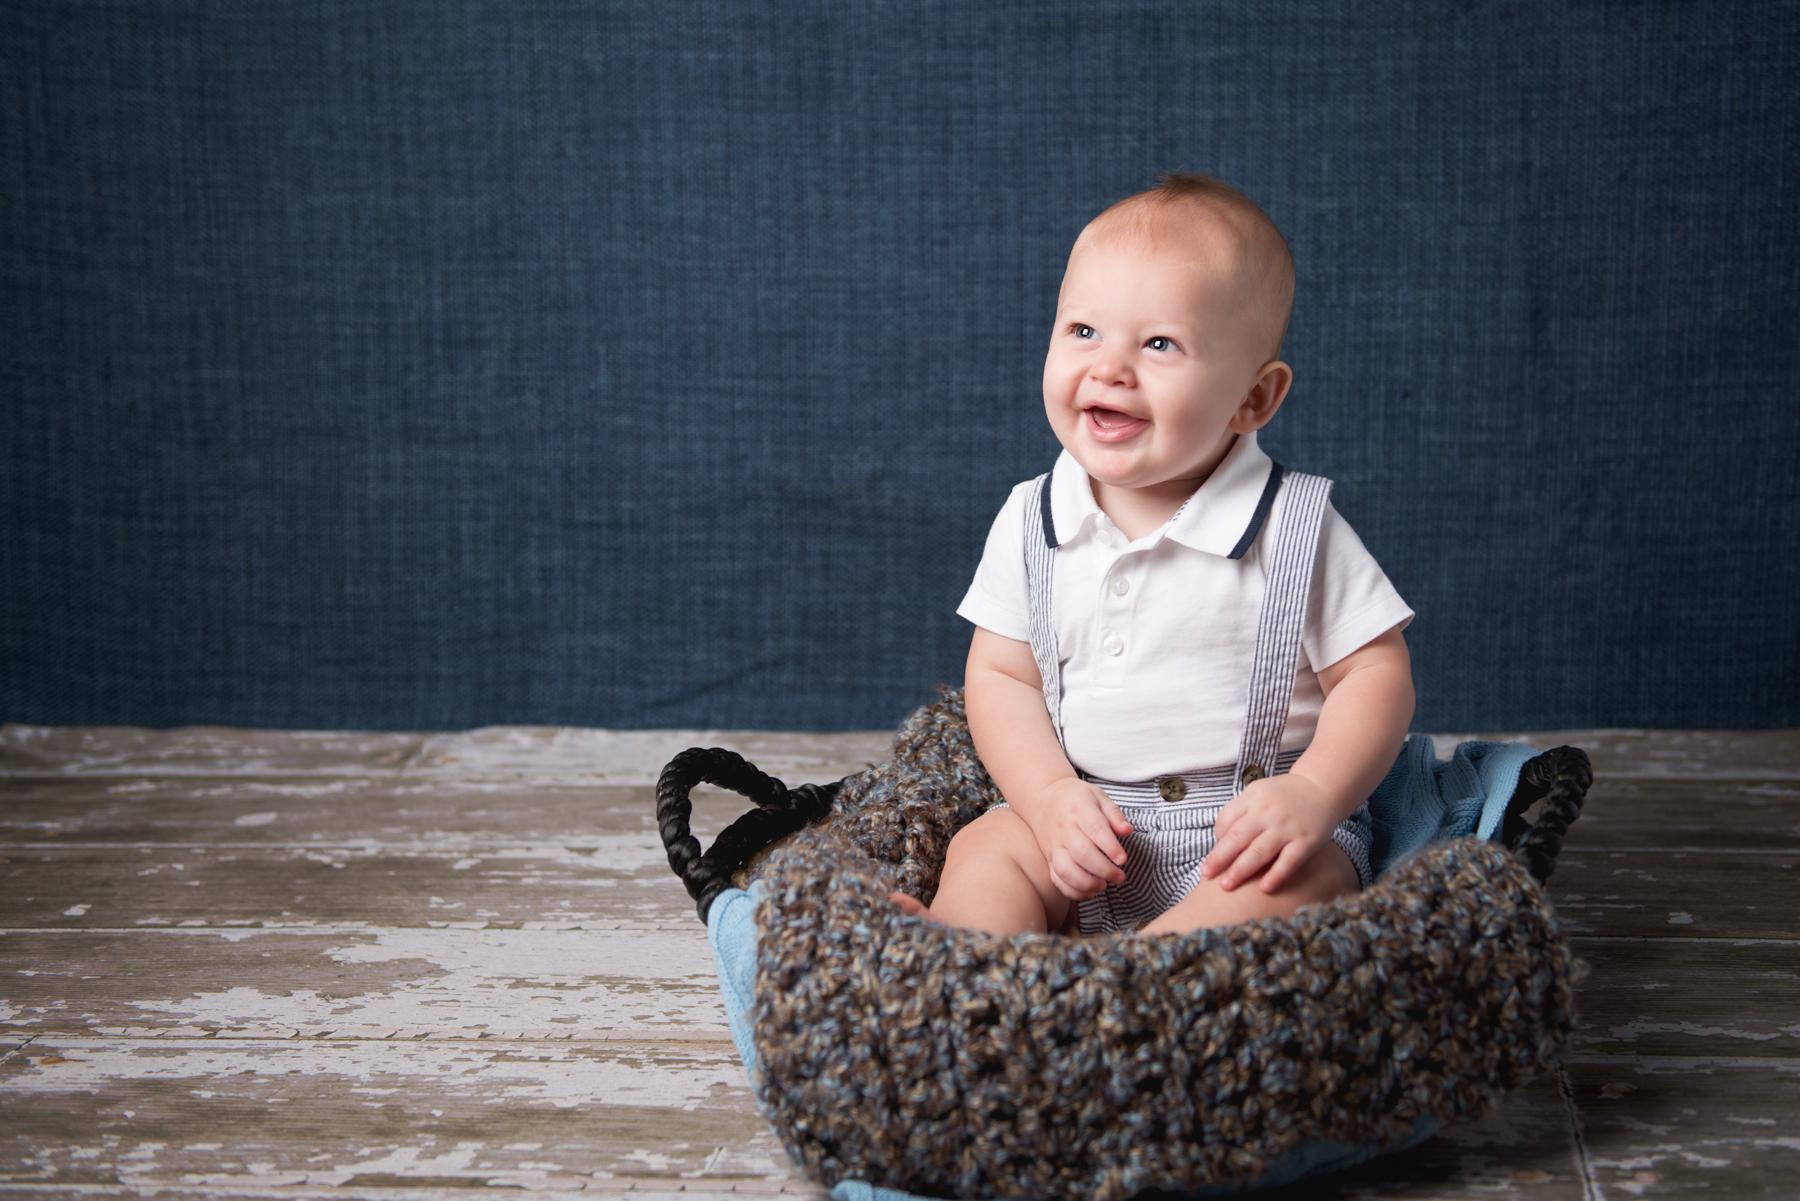 senoia baby photographer